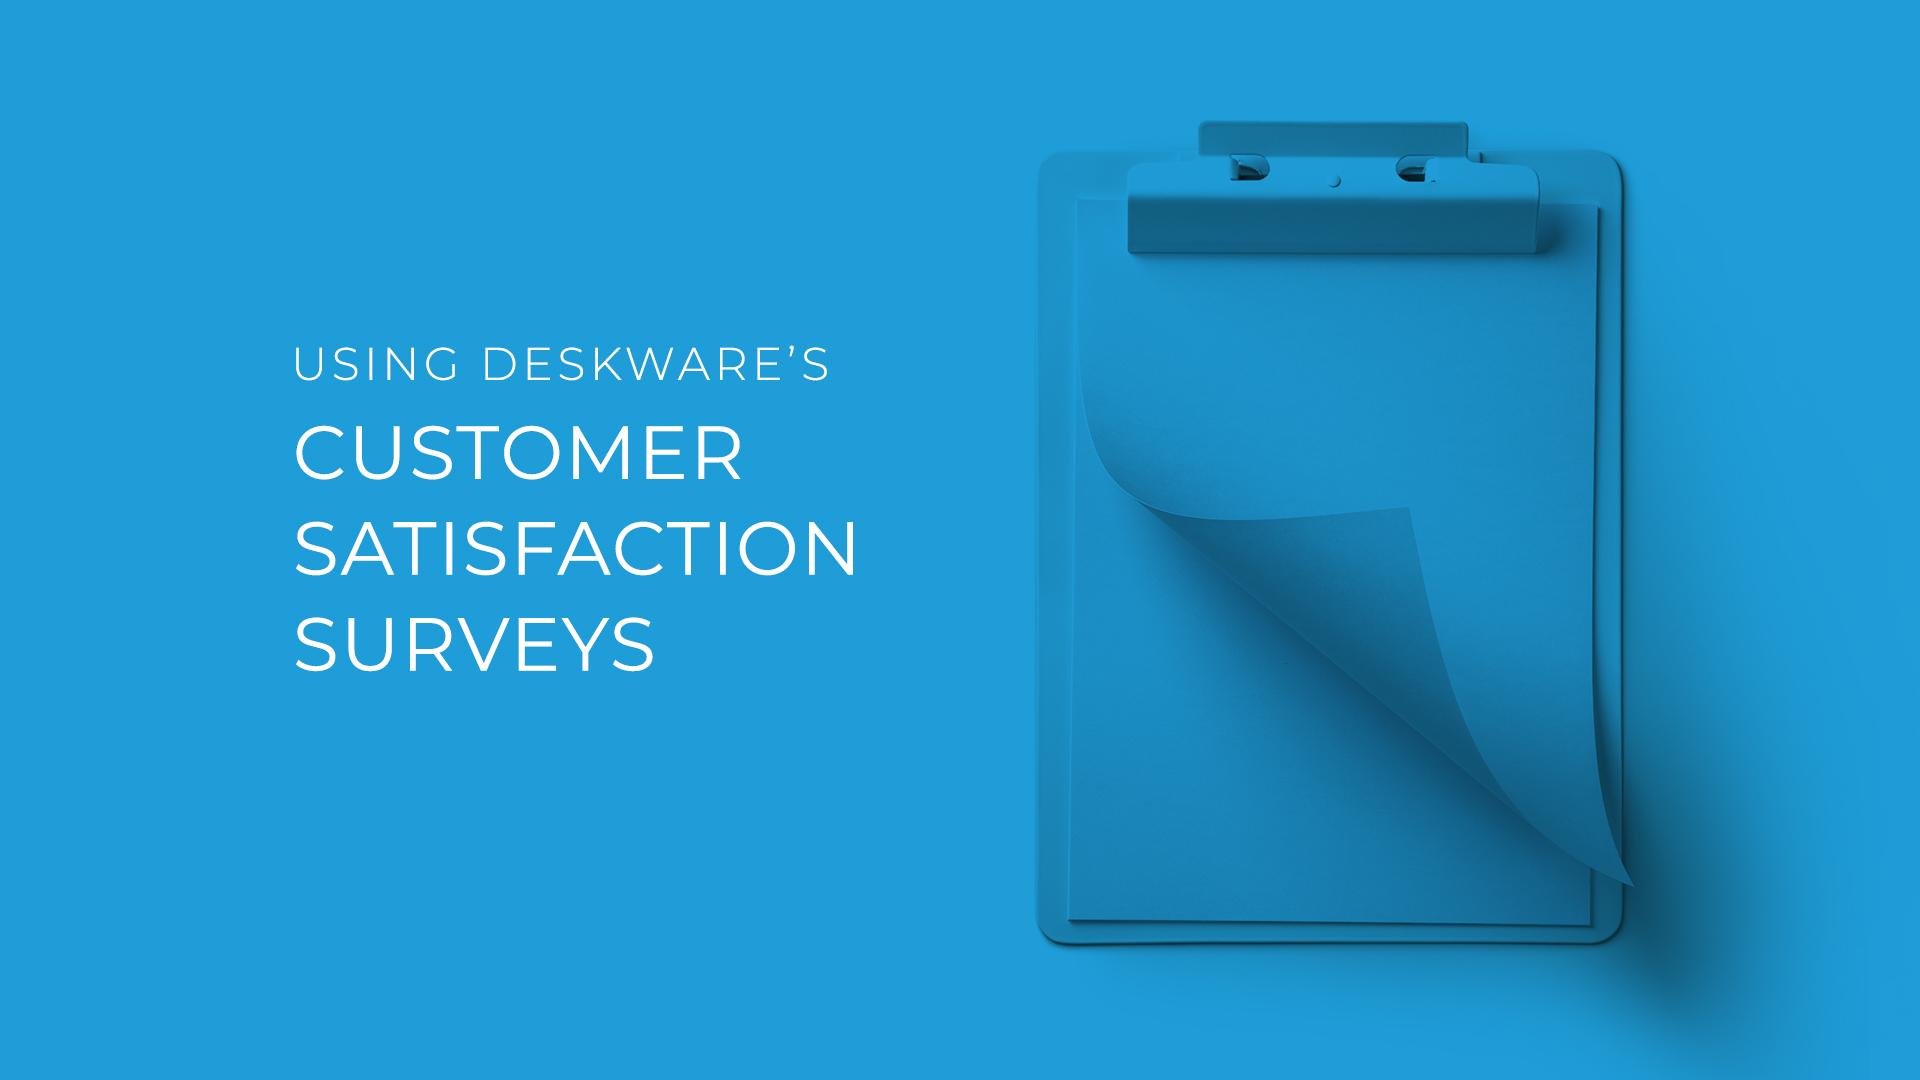 Using Deskware's Customer Satisfaction Surveys